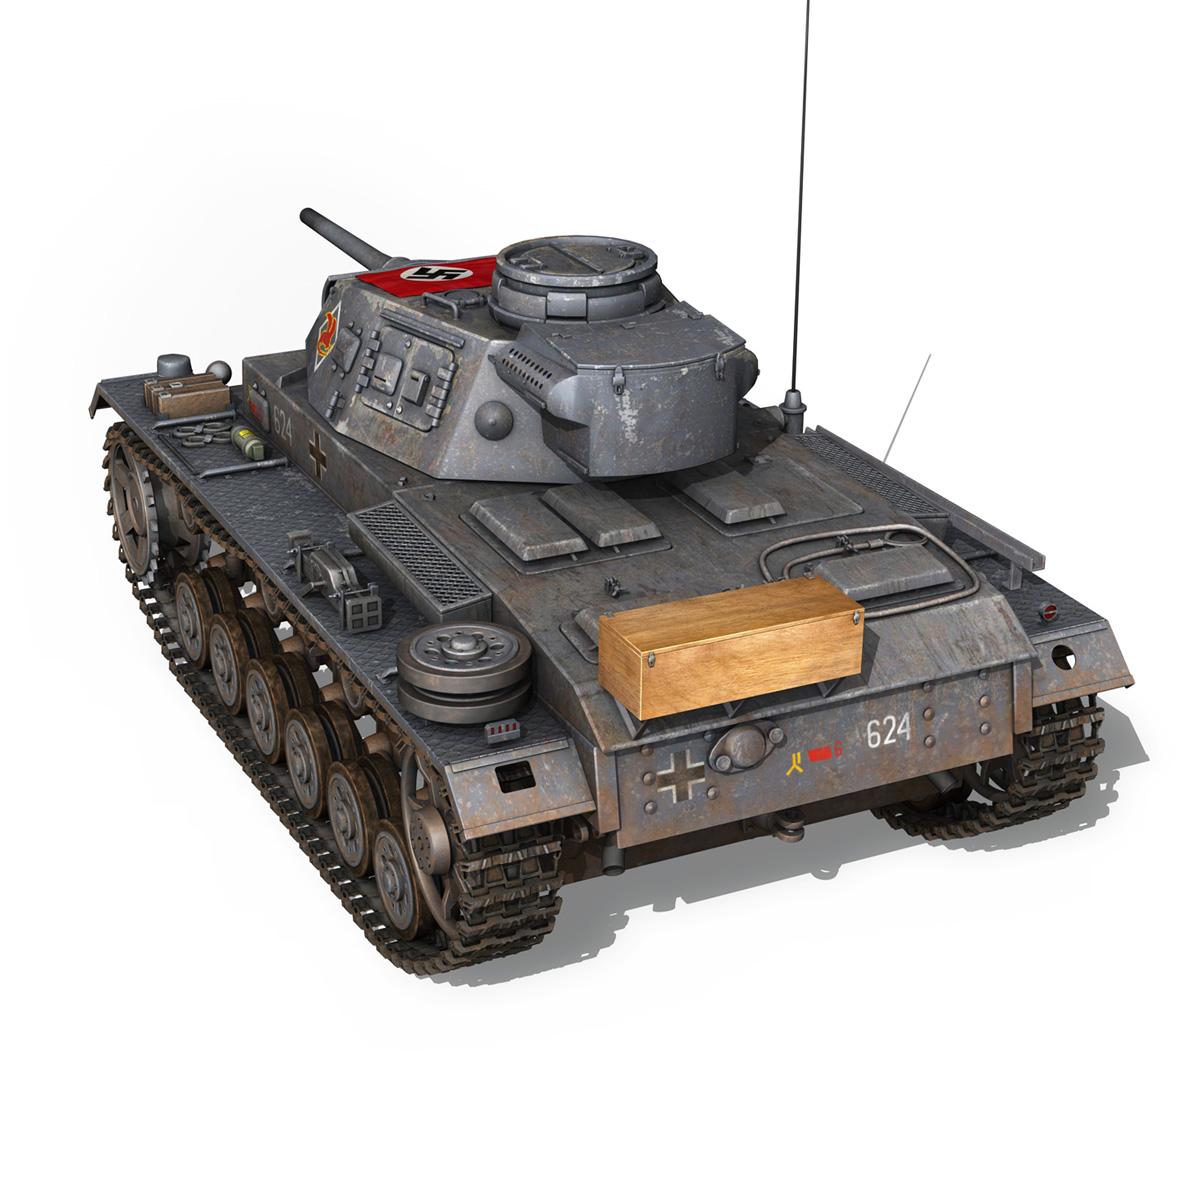 pzkpfw iii – panzer 3 – ausf.j – 624 3d model 3ds fbx lwo lw lws obj c4d 265302